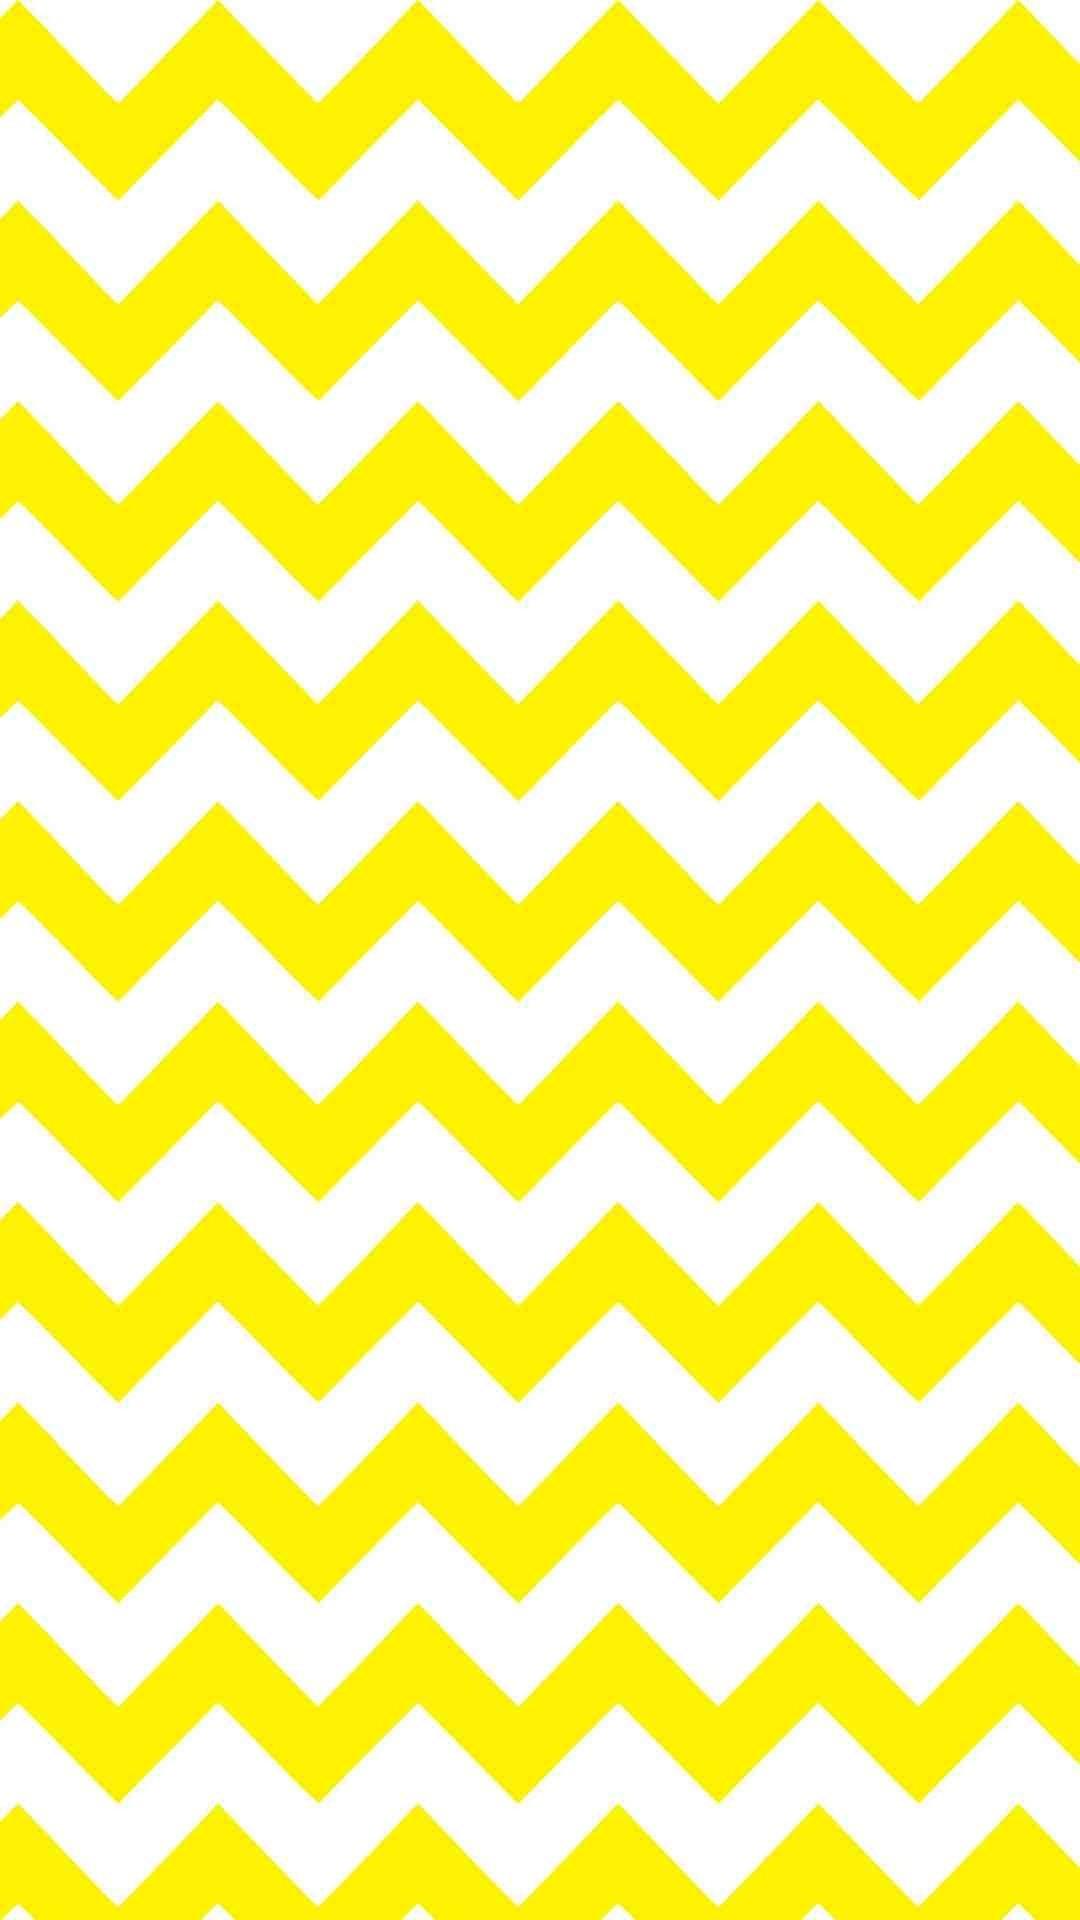 1080x1920 Yellow And White Chevron IPhone 6 Plus Wallpaper   Zigzag  Pattern, #iPhone #